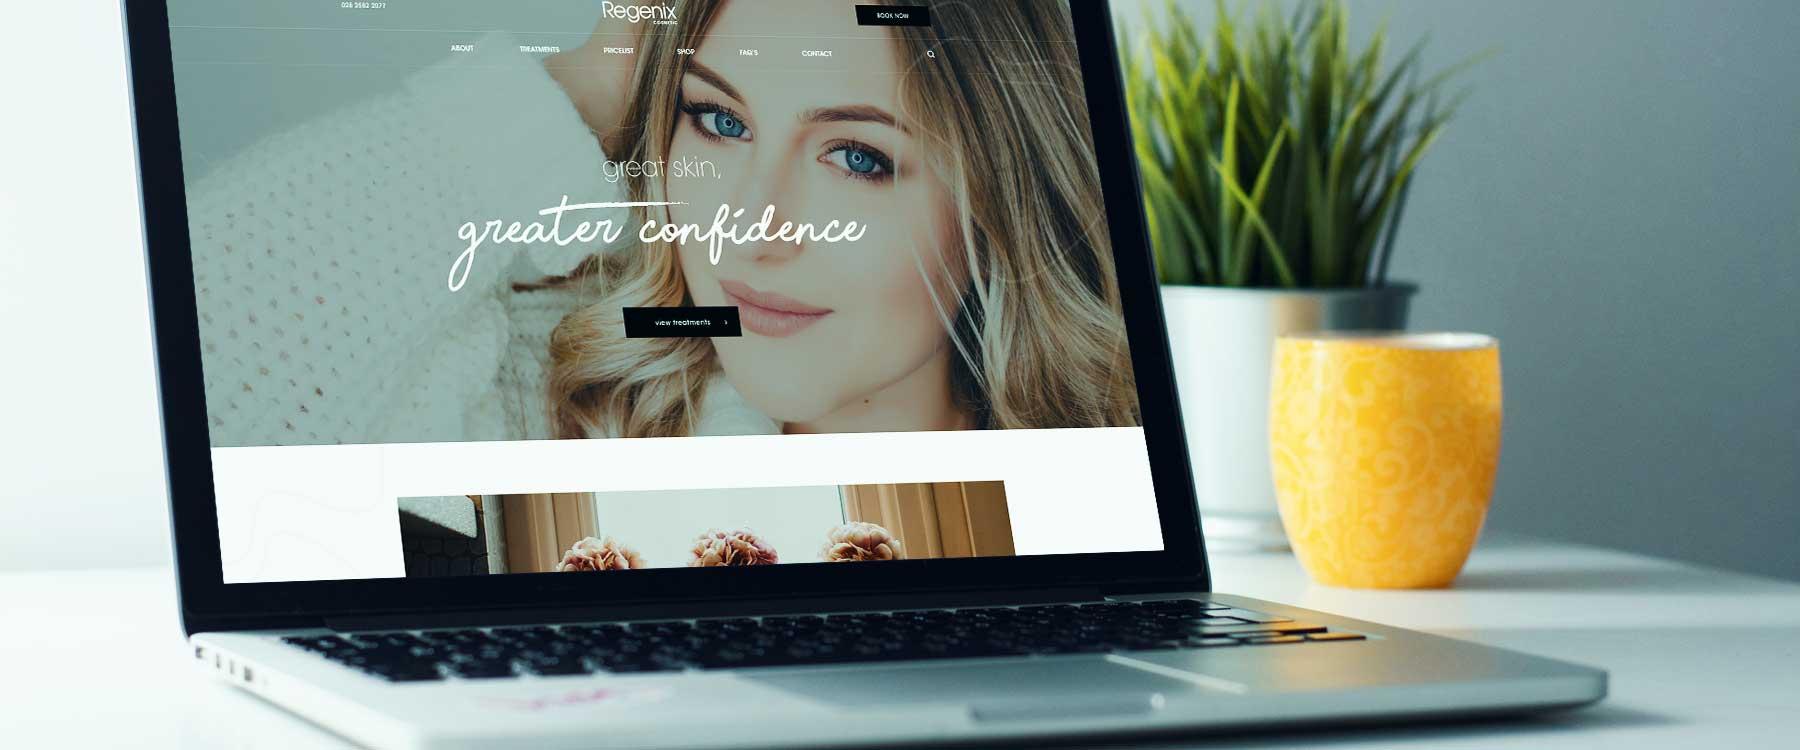 Visually Engaging Website For Regenix Cosmetics Image